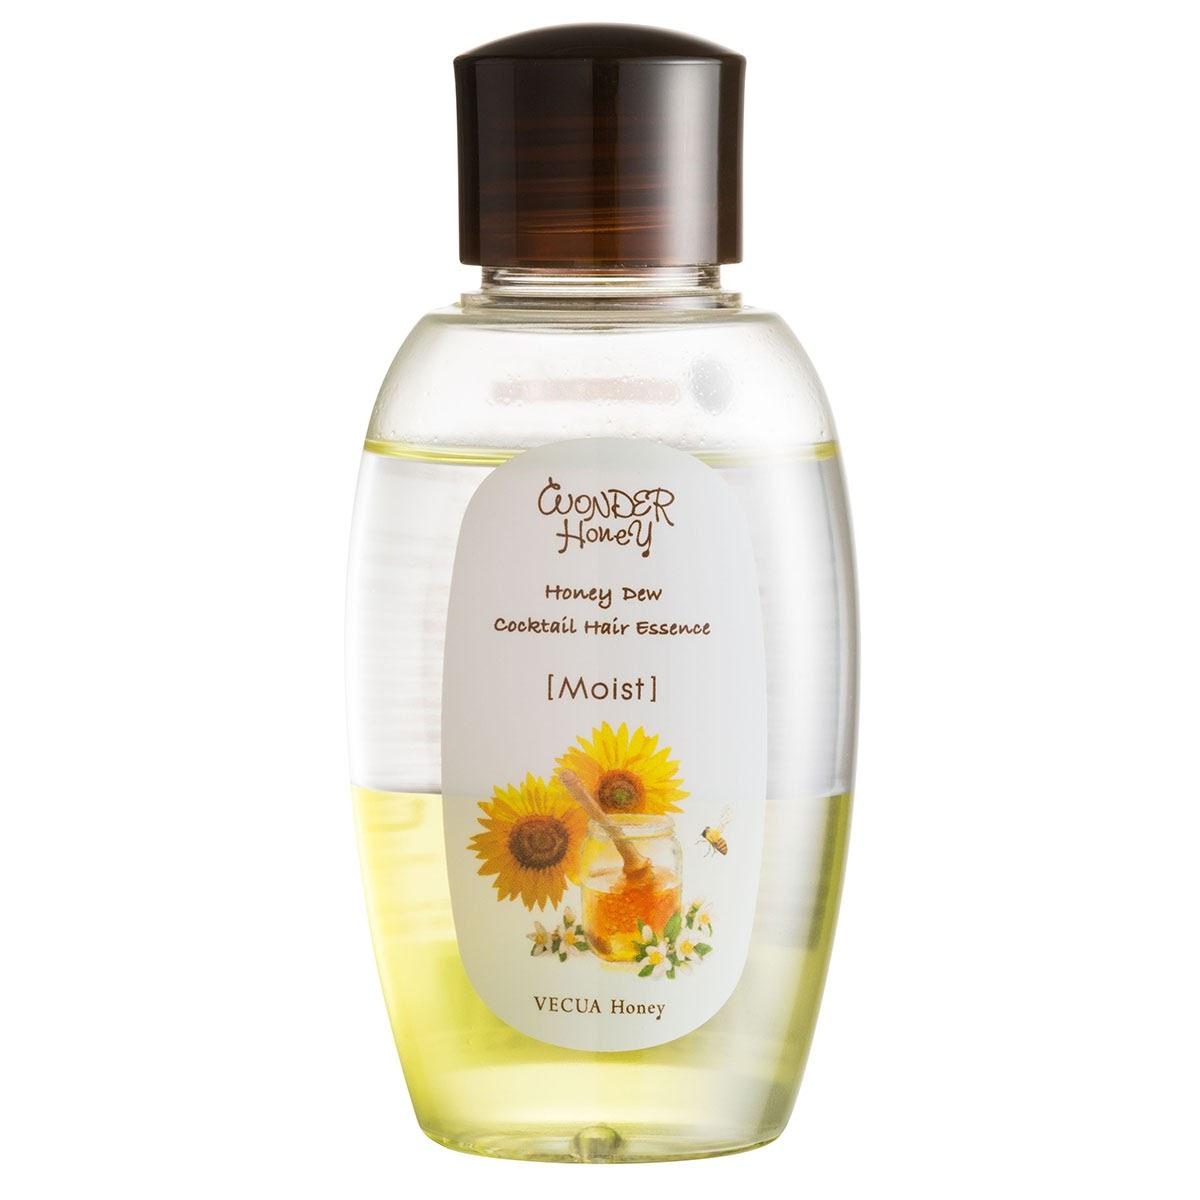 VECUA Honey(ベキュアハニー)の人気ヘアケアアイテム2種を口コミ付きで紹介! の画像